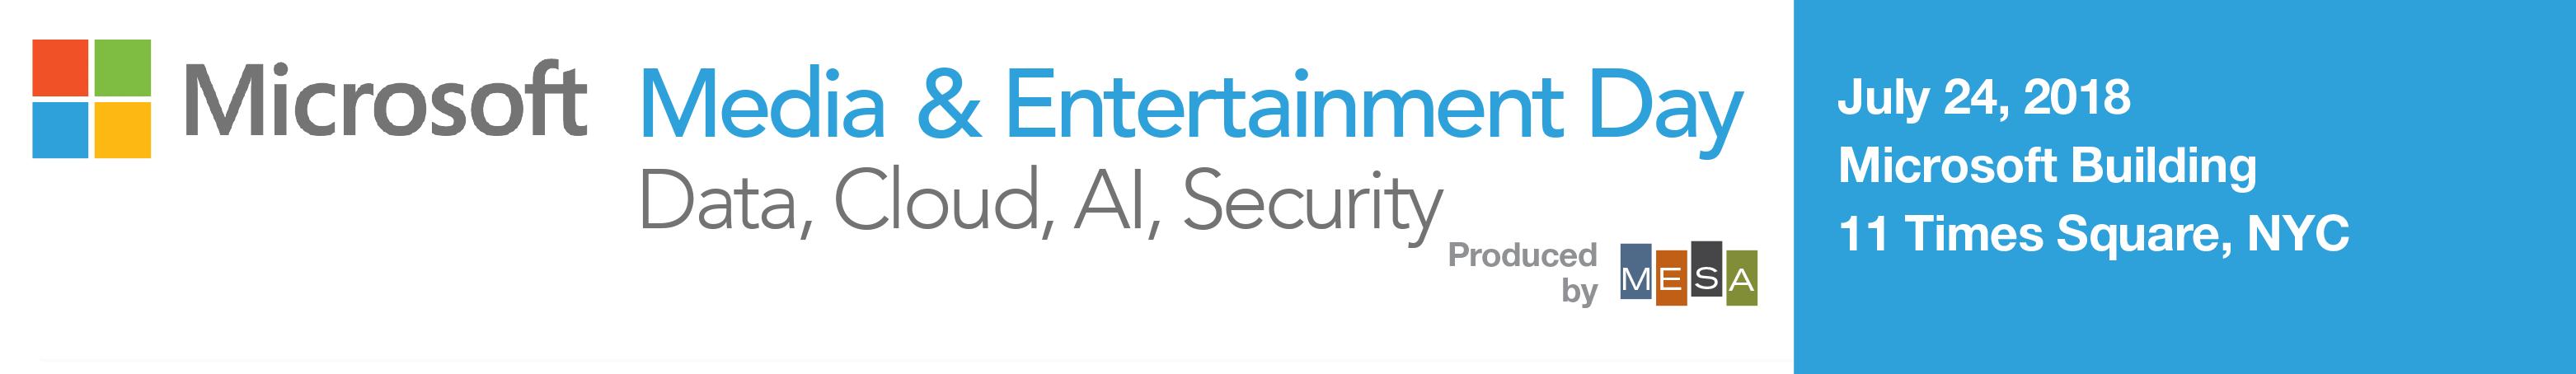 Microsoft Media & Entertainment Day 2018